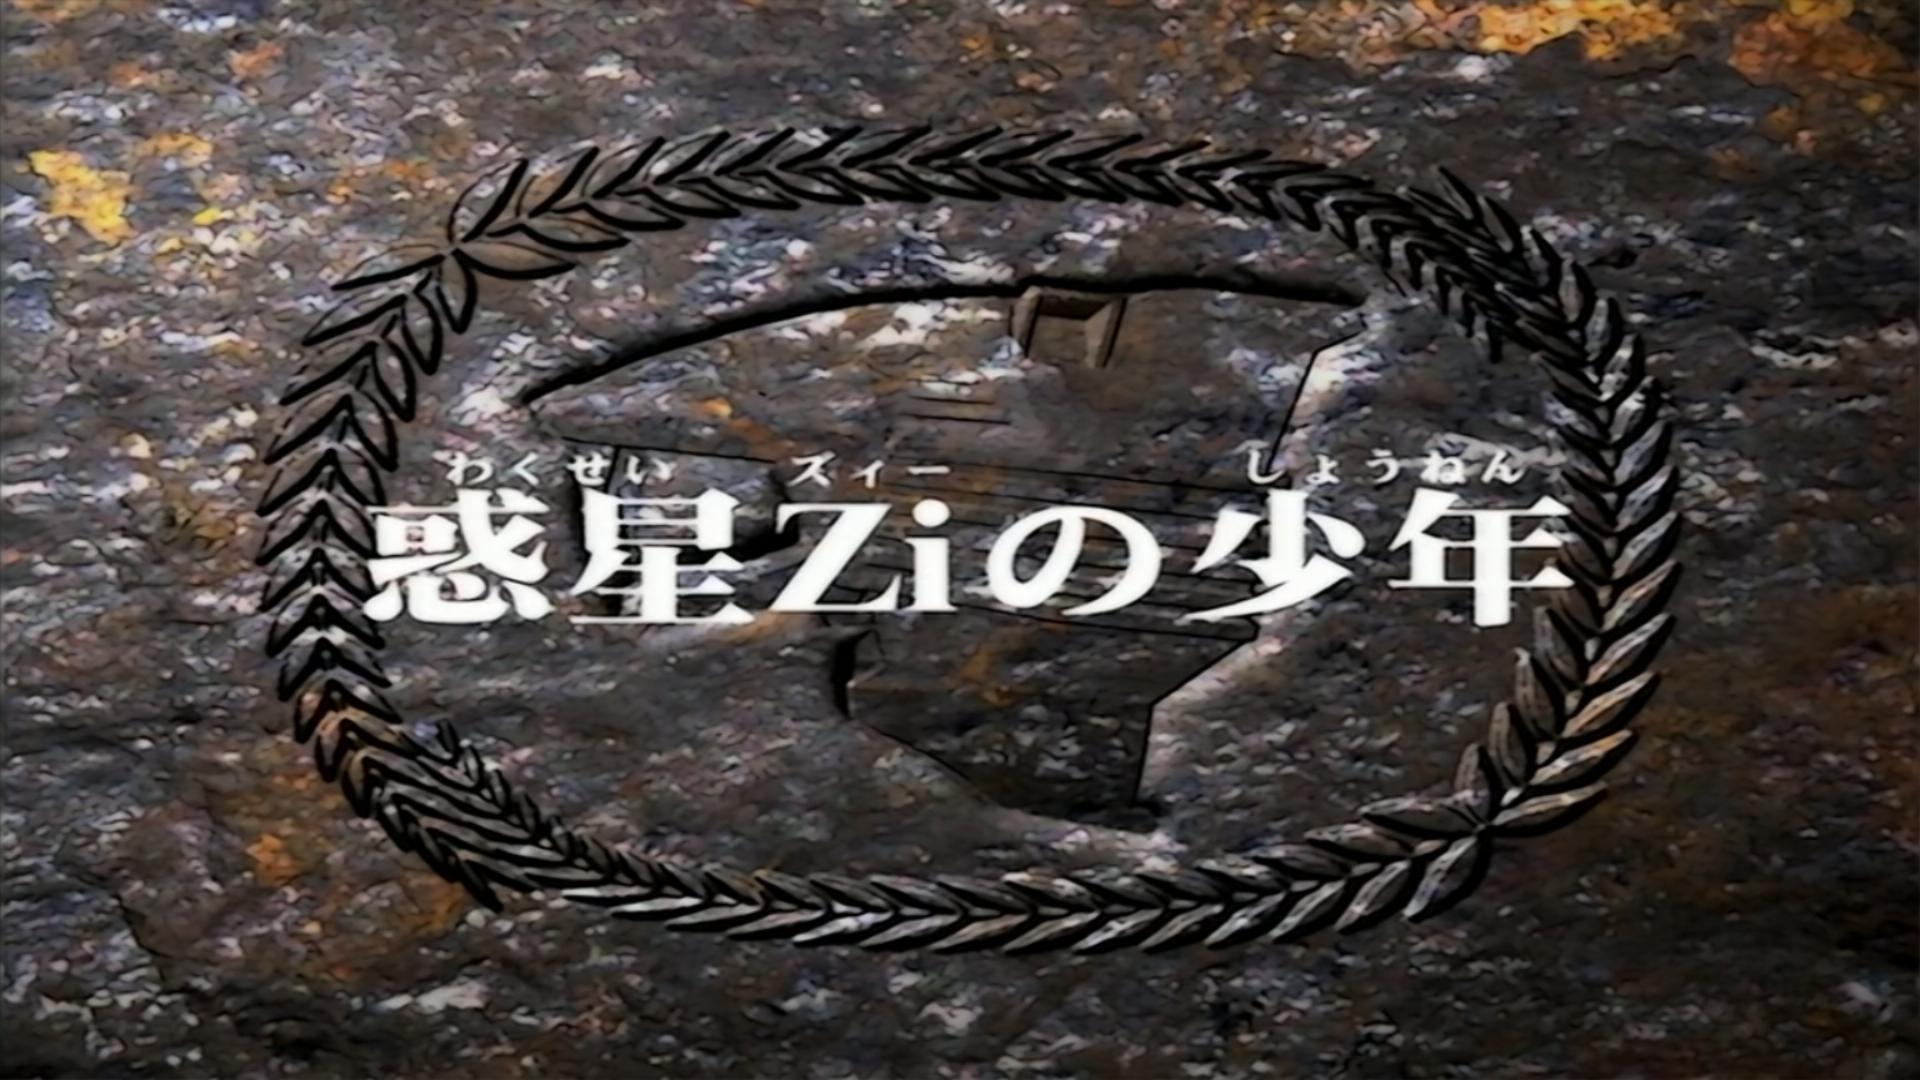 Zoids: Chaotic Century Episode 1